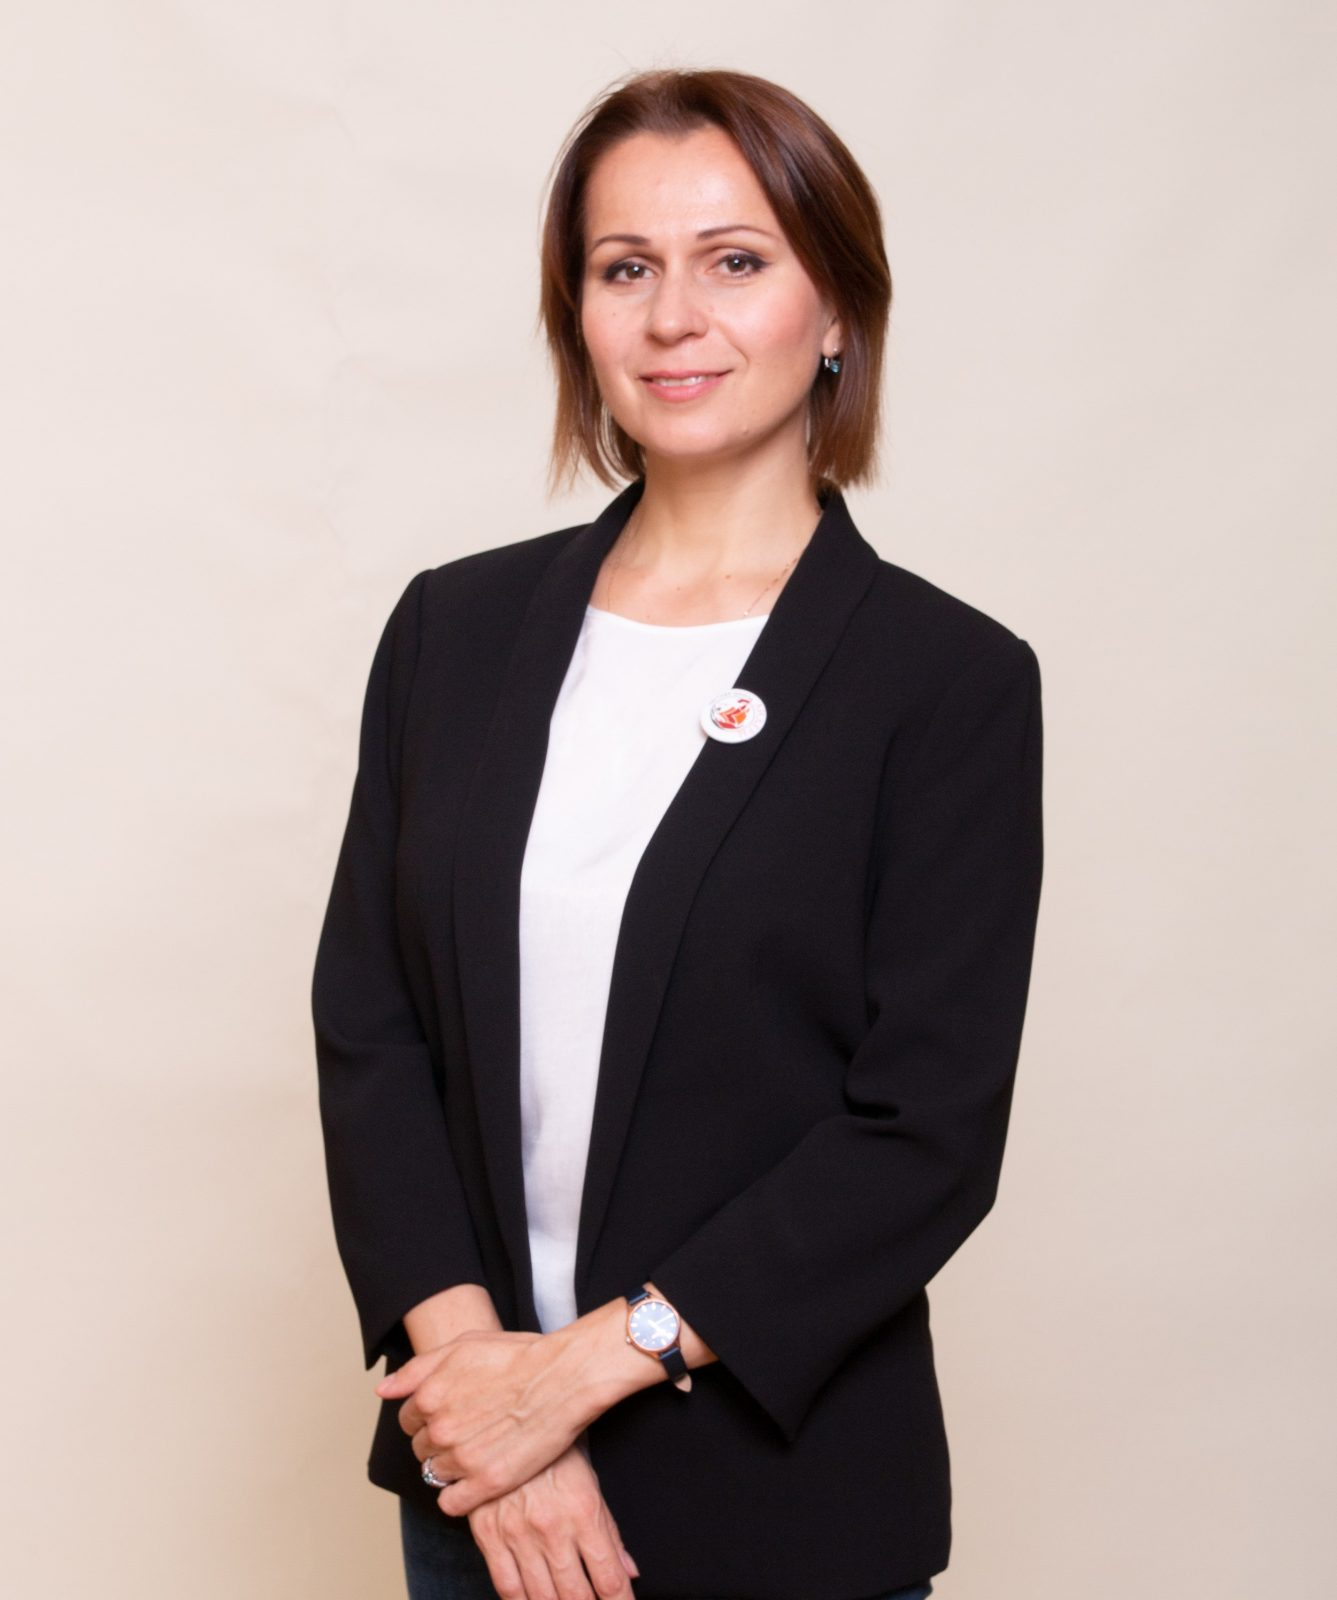 Богомолова Ольга Евгеньевна